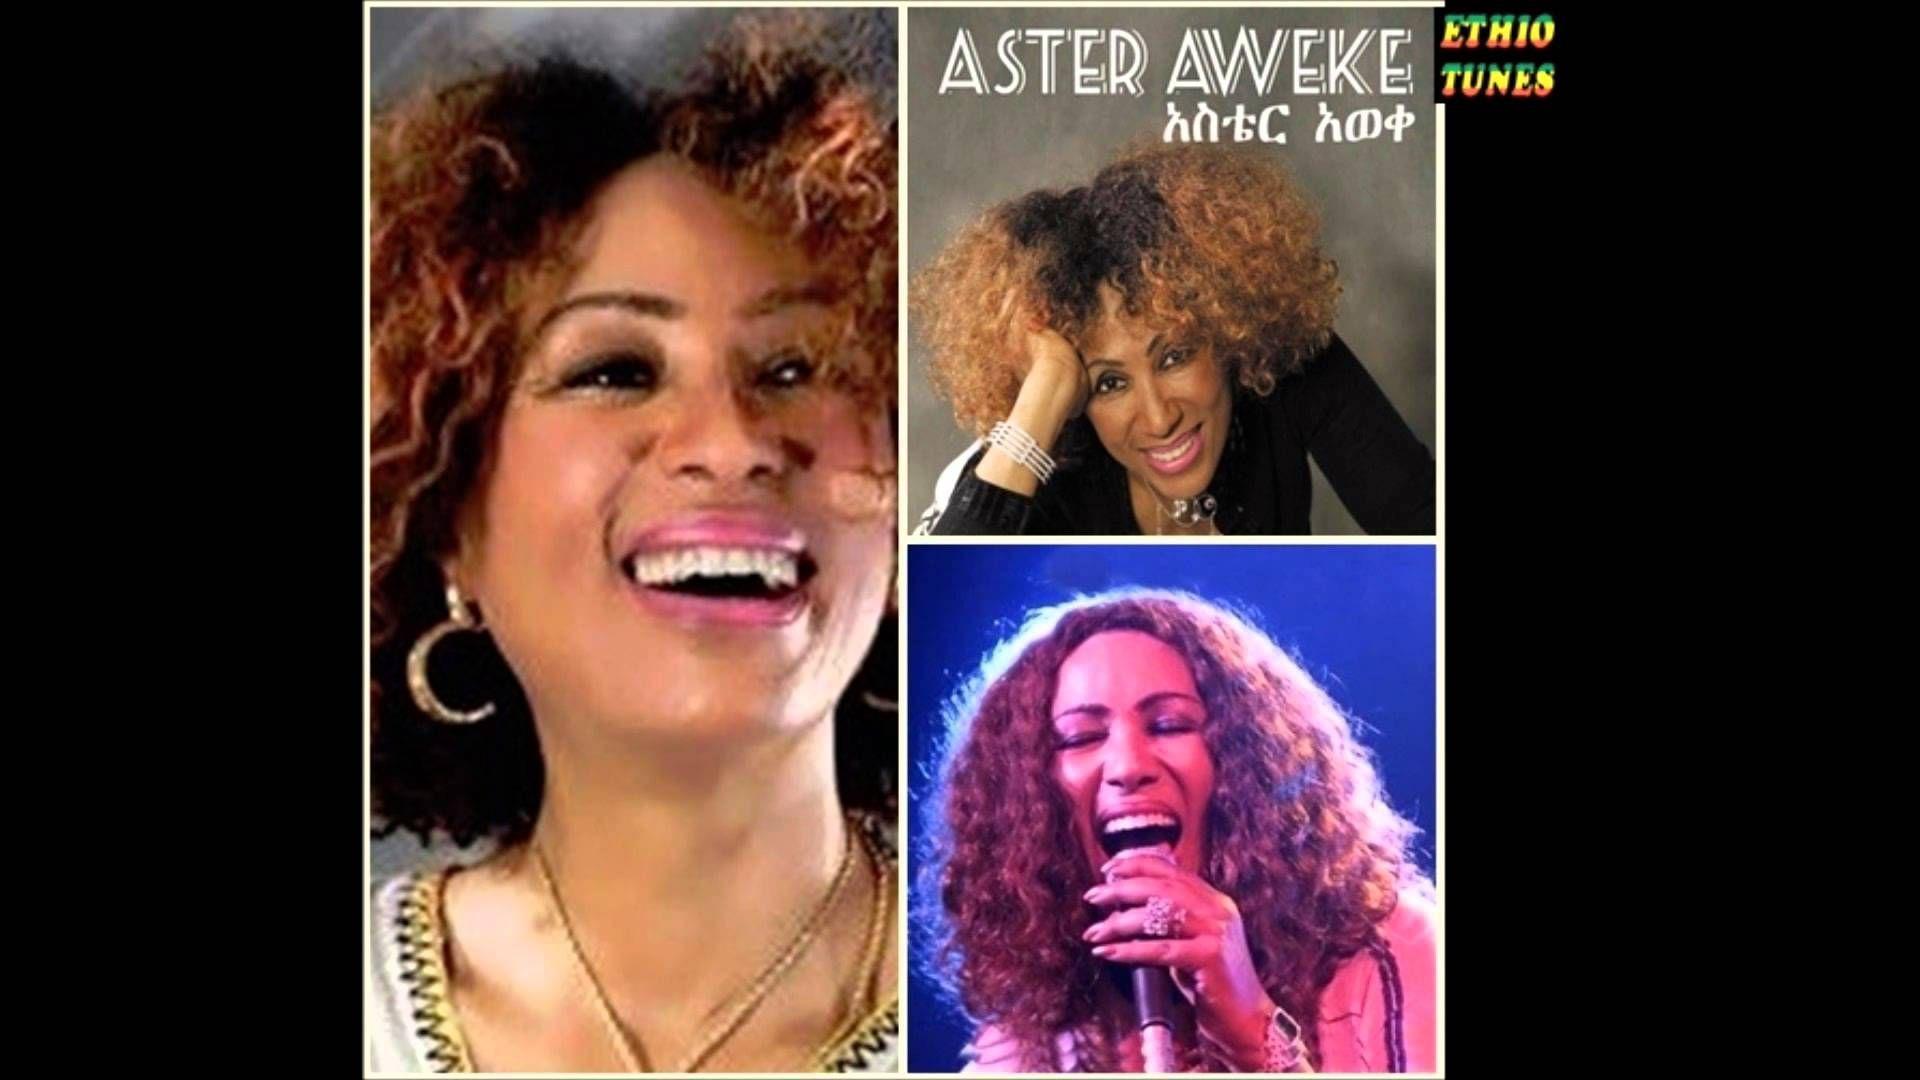 Aster Aweke Hid Demo (ሂድ ደሞ) New Ethiopian Slow Music